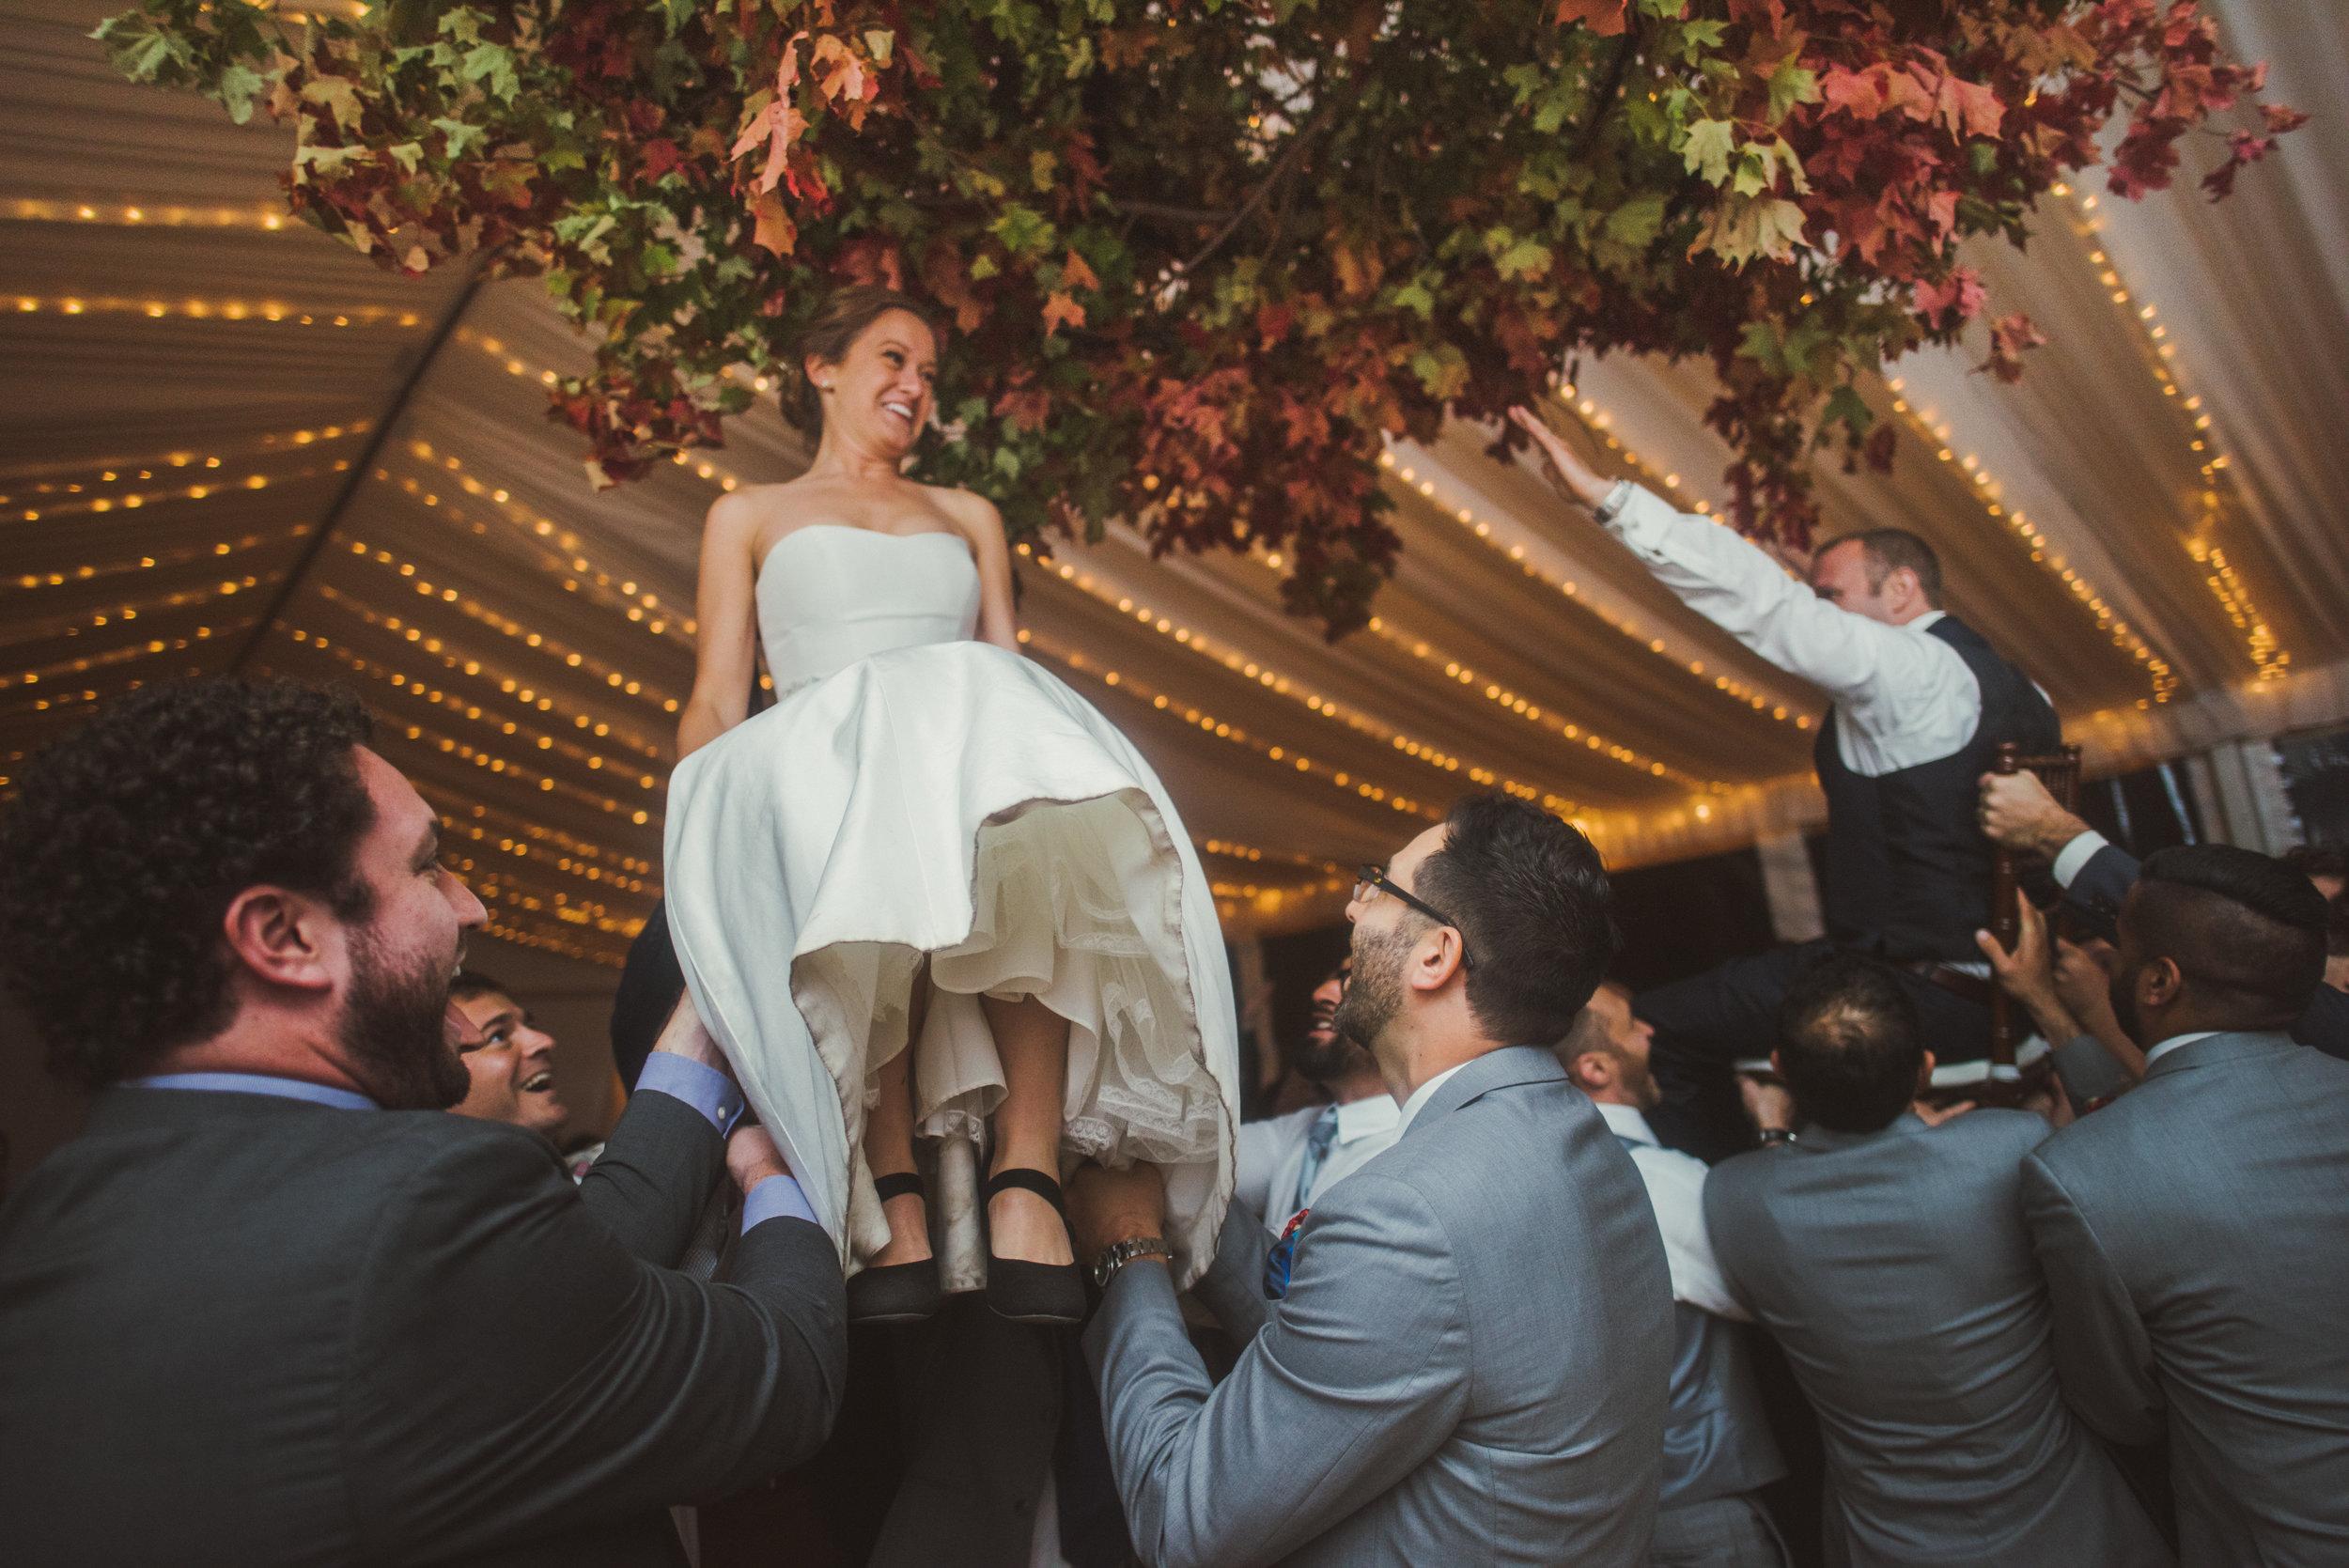 JACQUELINE & ANDREW WARSHAWER -BROOKMILL FARM FALL WEDDING - INTIMATE WEDDING PHOTOGRAPHER - TWOTWENTY by CHI-CHI AGBIM-663.jpg